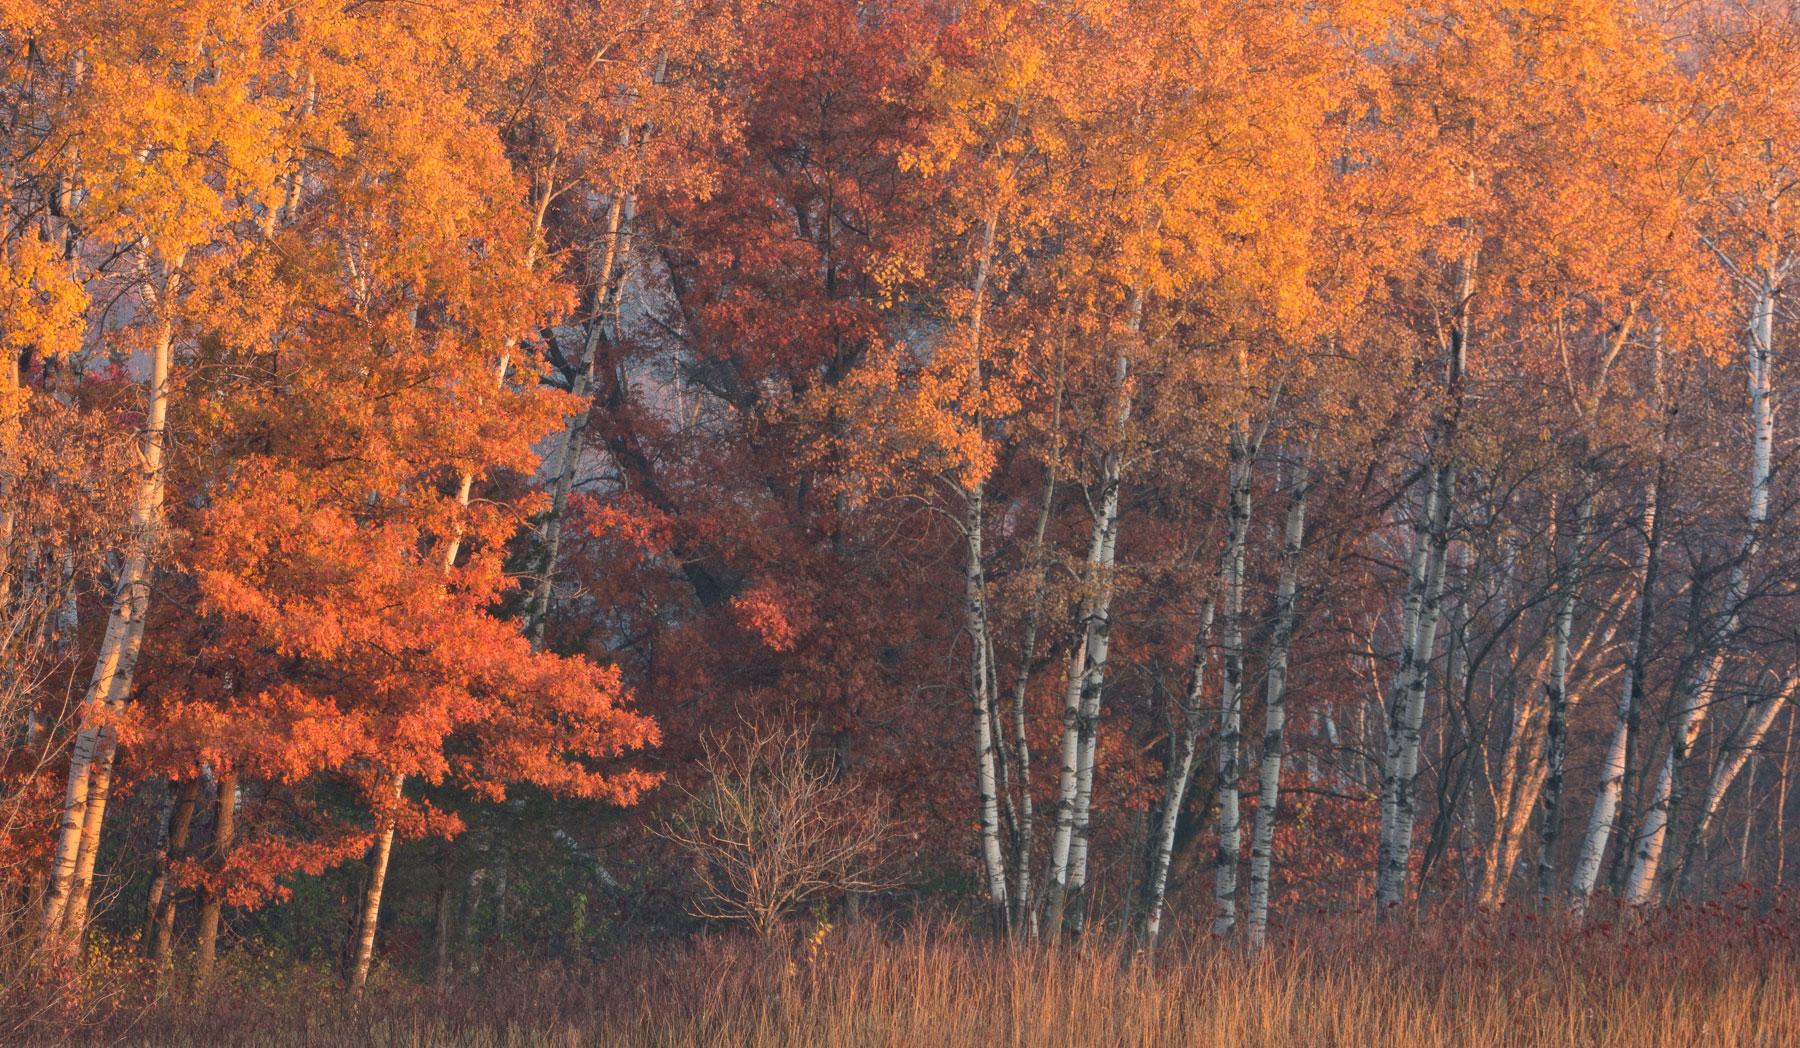 Yellow and Red in Morning Light - Minnesota  Nikon D7200 + Nikon 200-400mm f4.0 VR